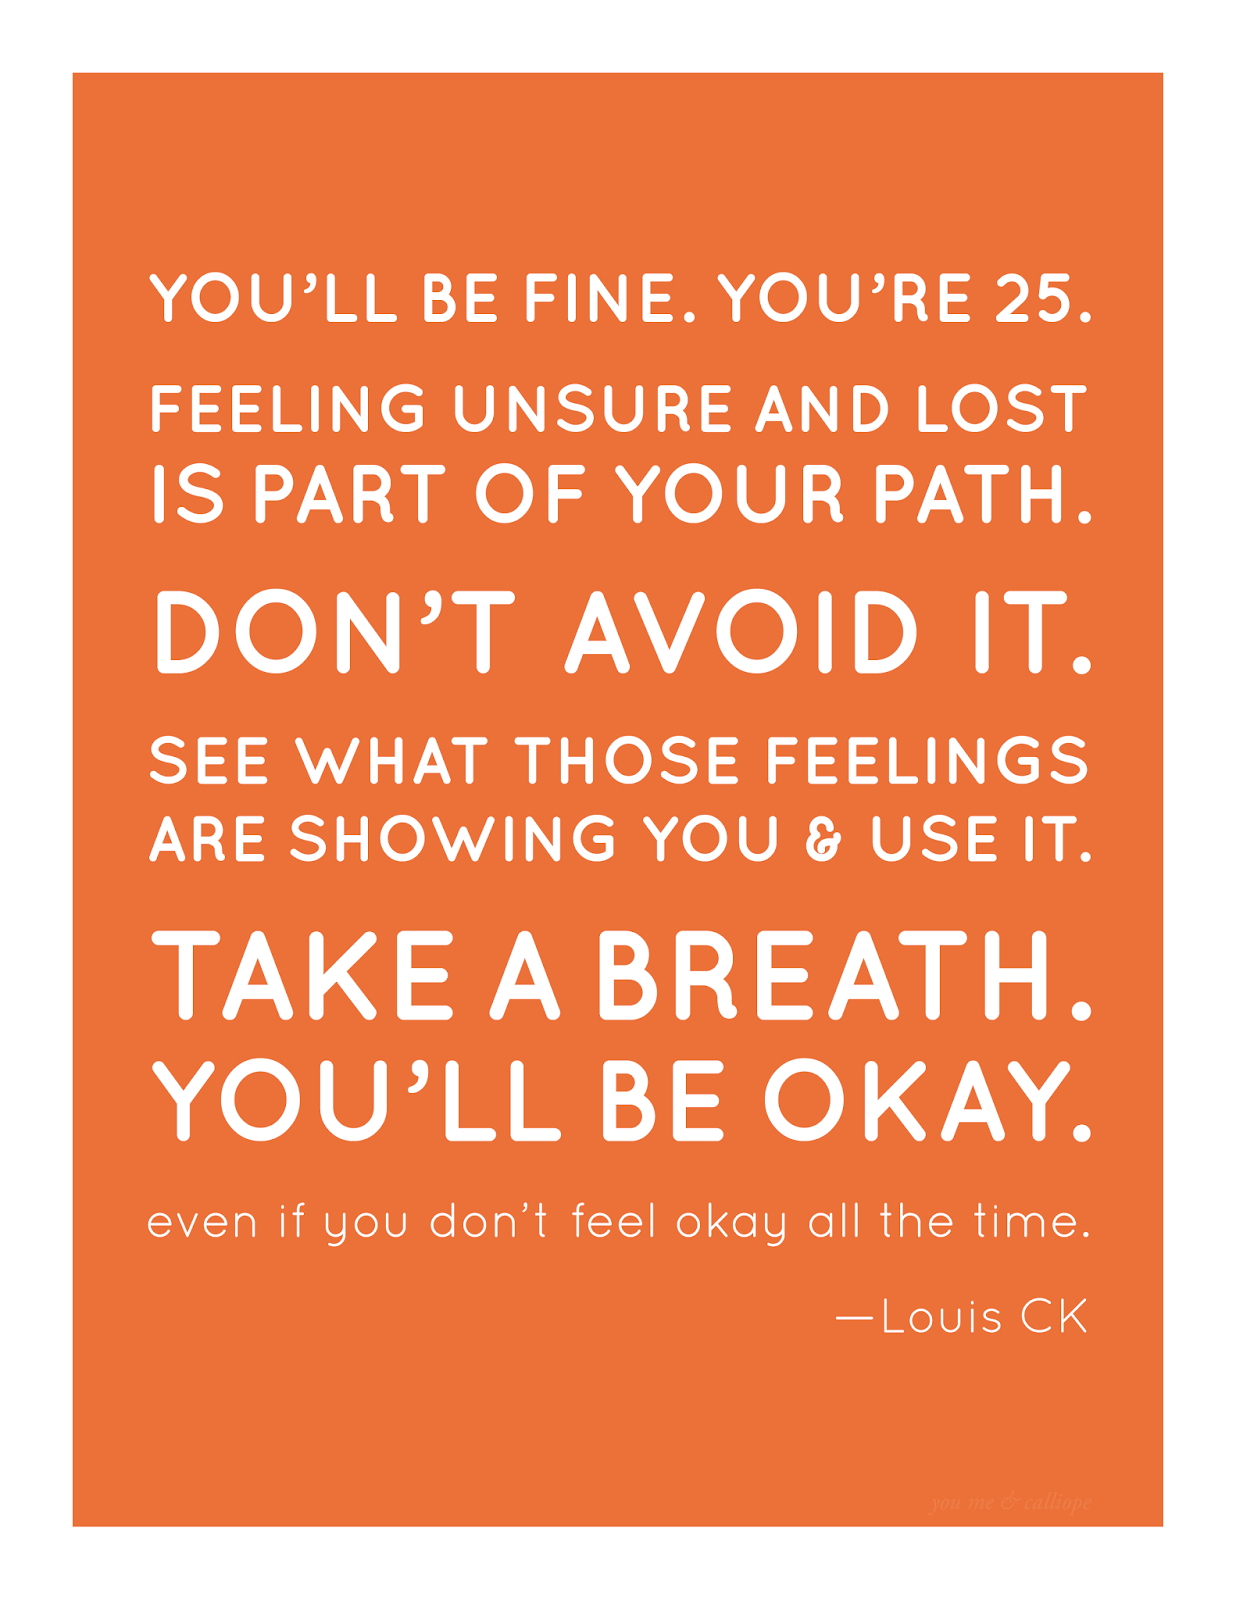 Unsure Quotes Louis Ck  Quotei Definitely Felt This At 25 Words Of Wisdom